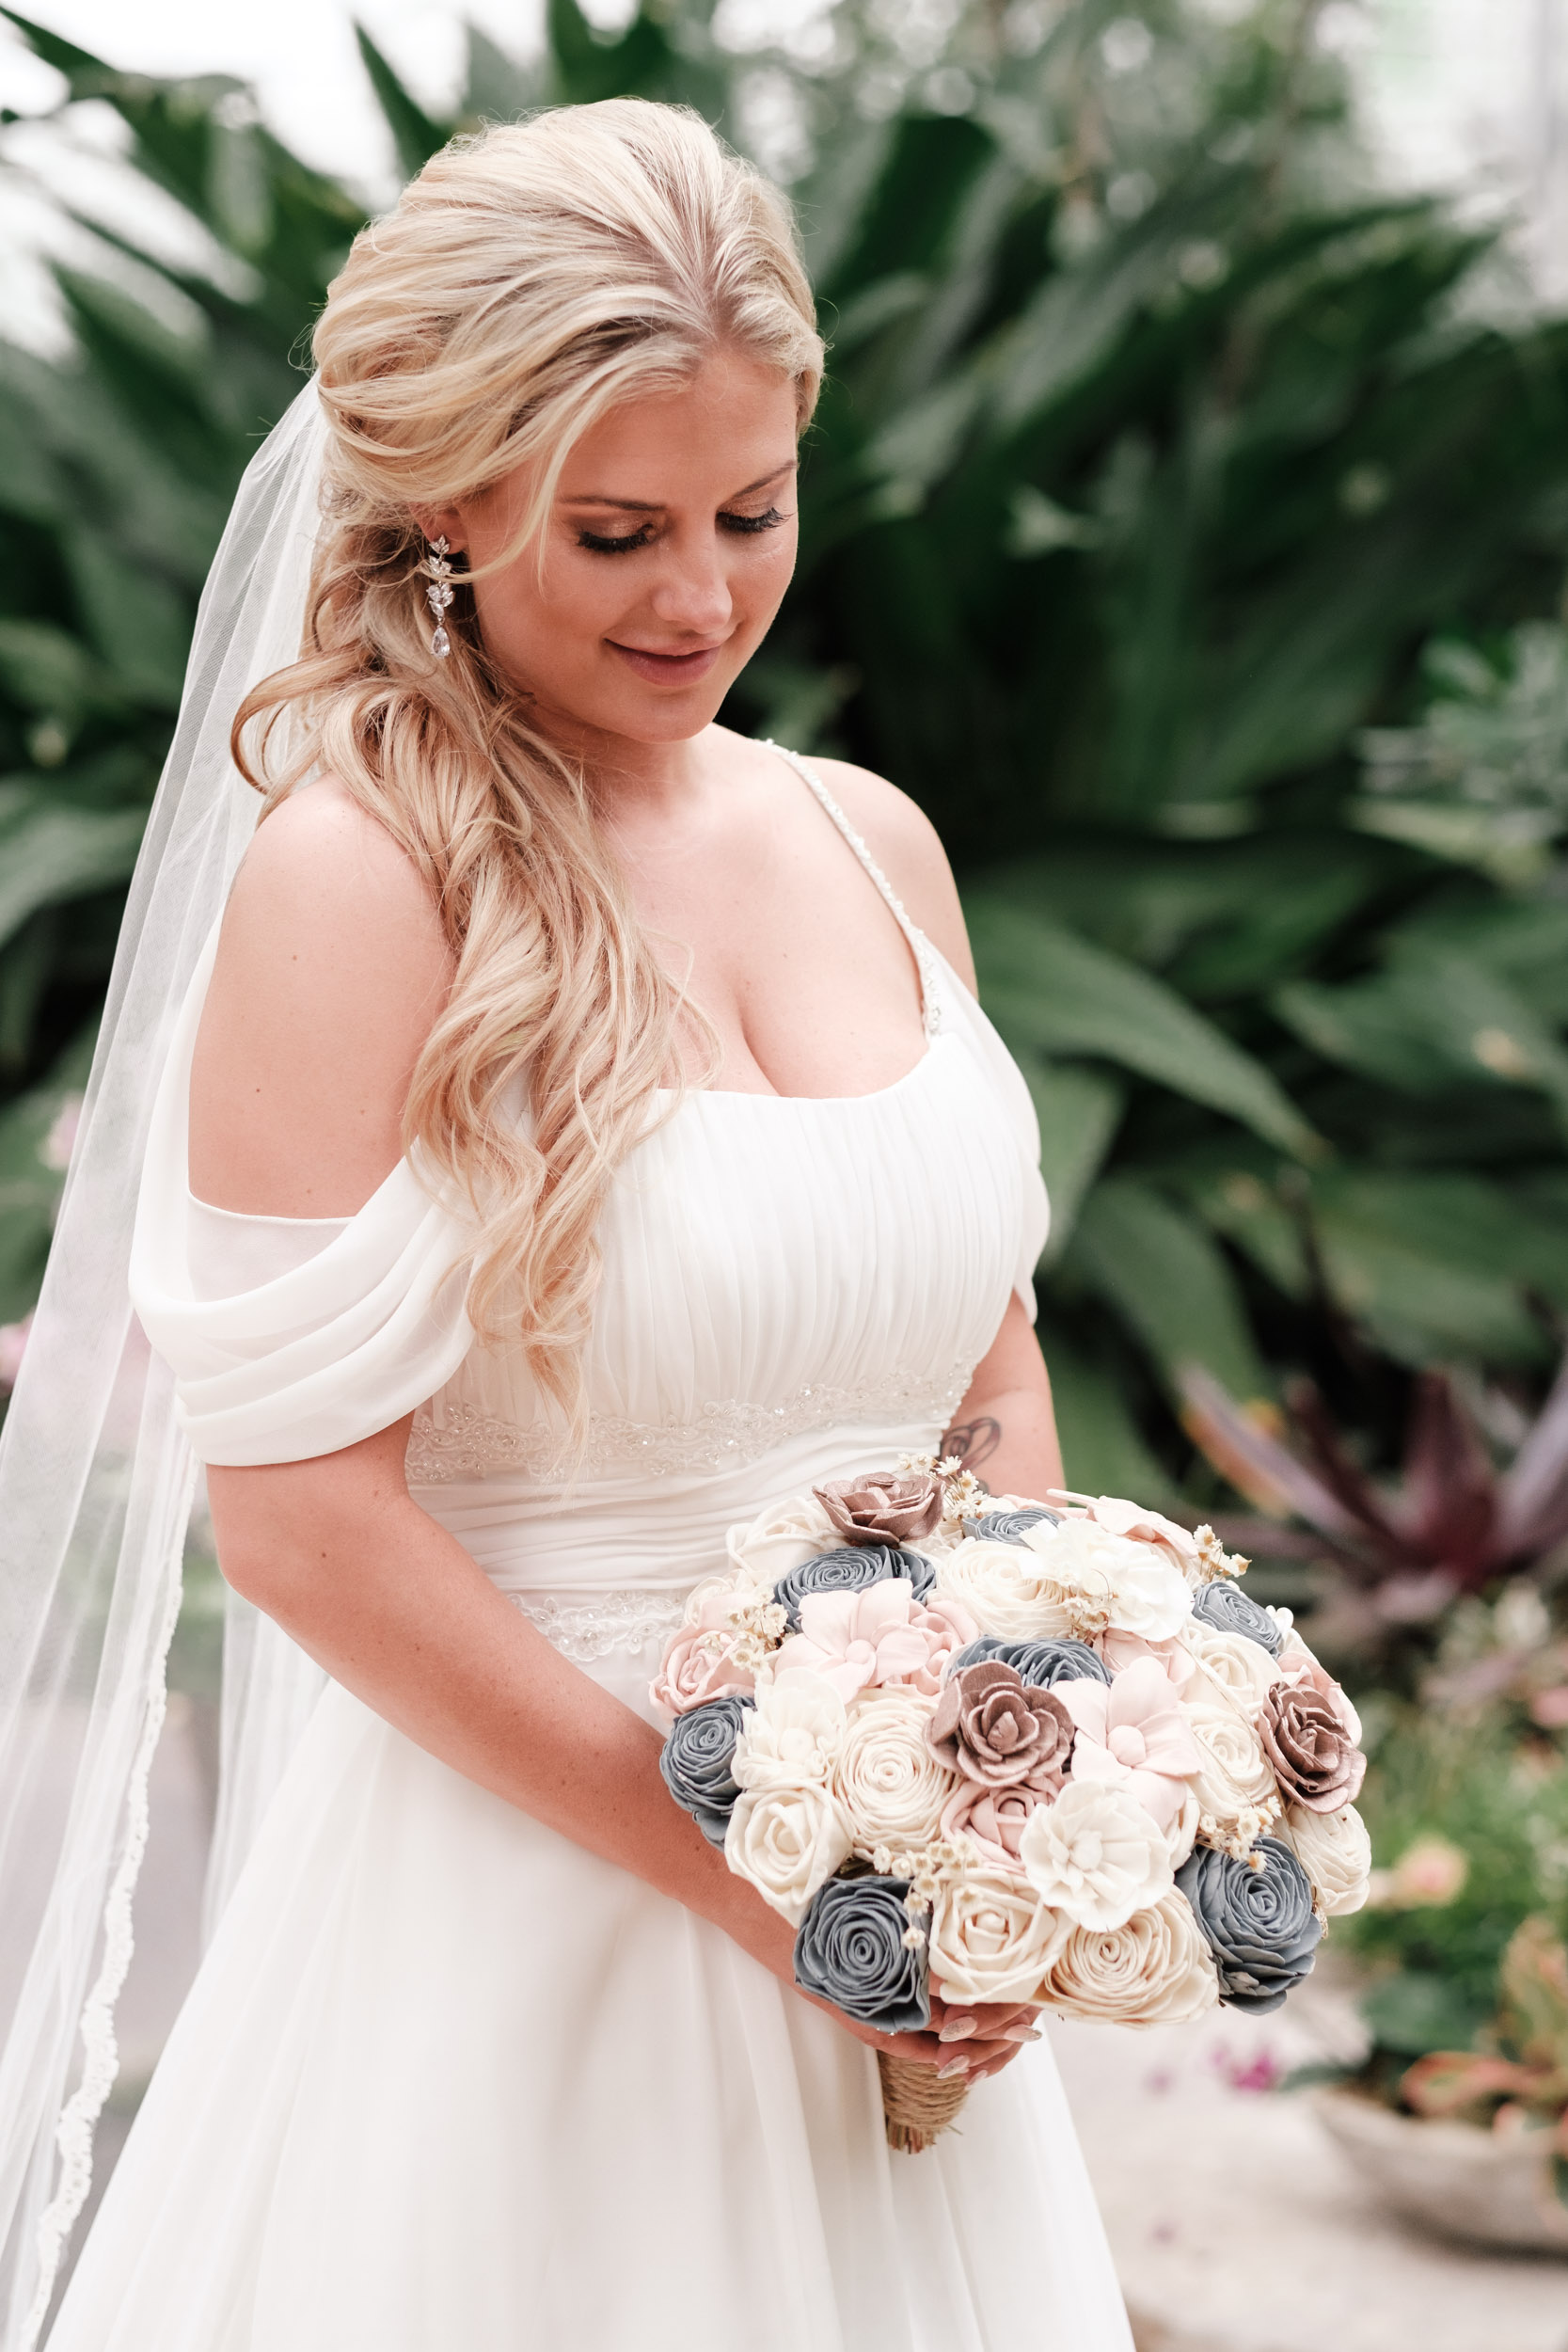 19-06-01 Megan Josh - Nicholas Conservatory Wedding-28.jpg